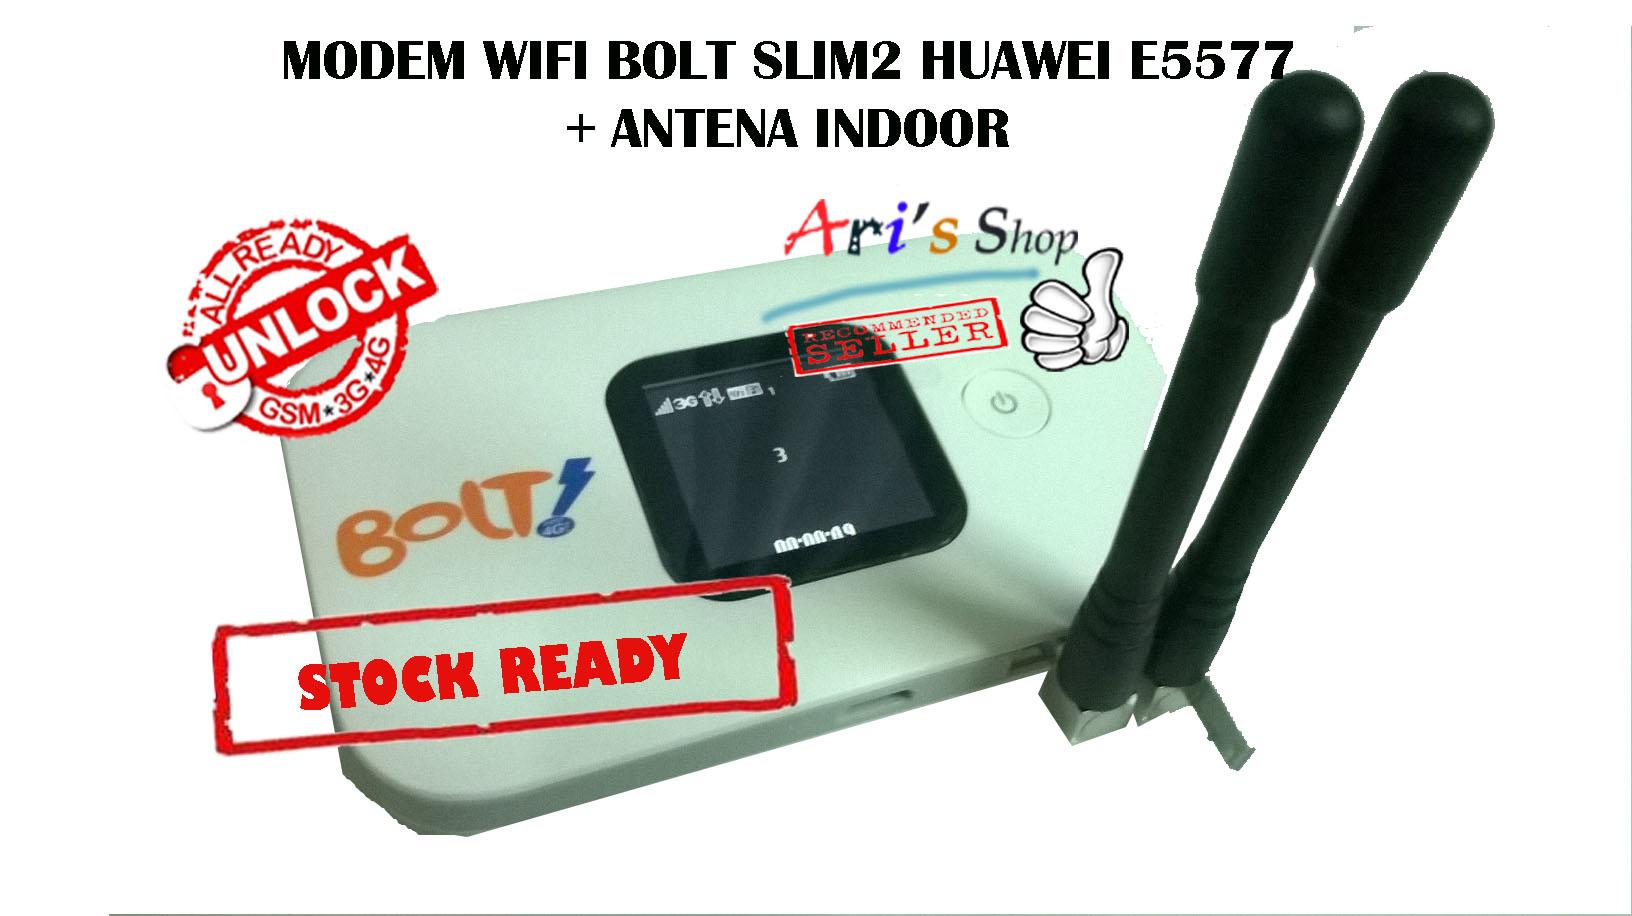 Jual MODEM WIFI 4G LTE BOLT SLIM2 SLIM 2 HUAWEI E5577 UNLOCK ANTENA INDOOR